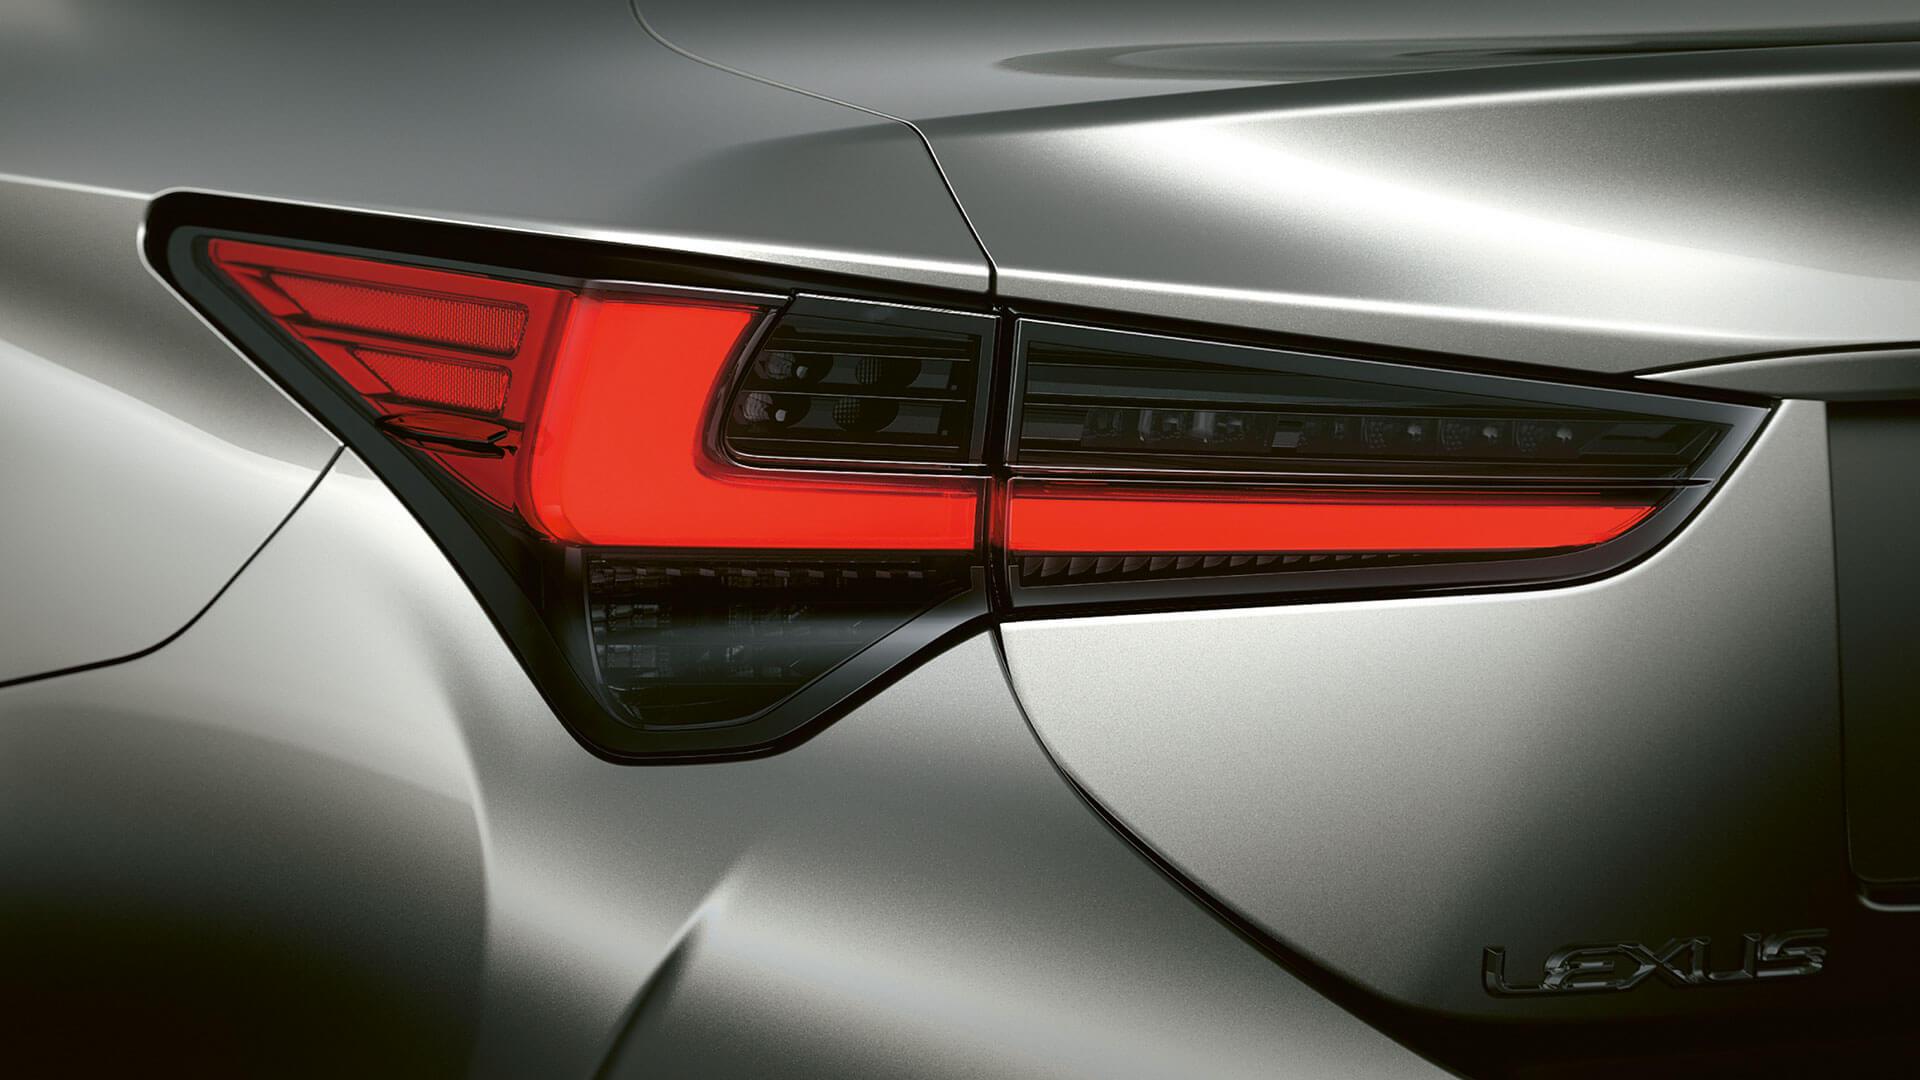 2018 lexus rc hotspot led rear lights